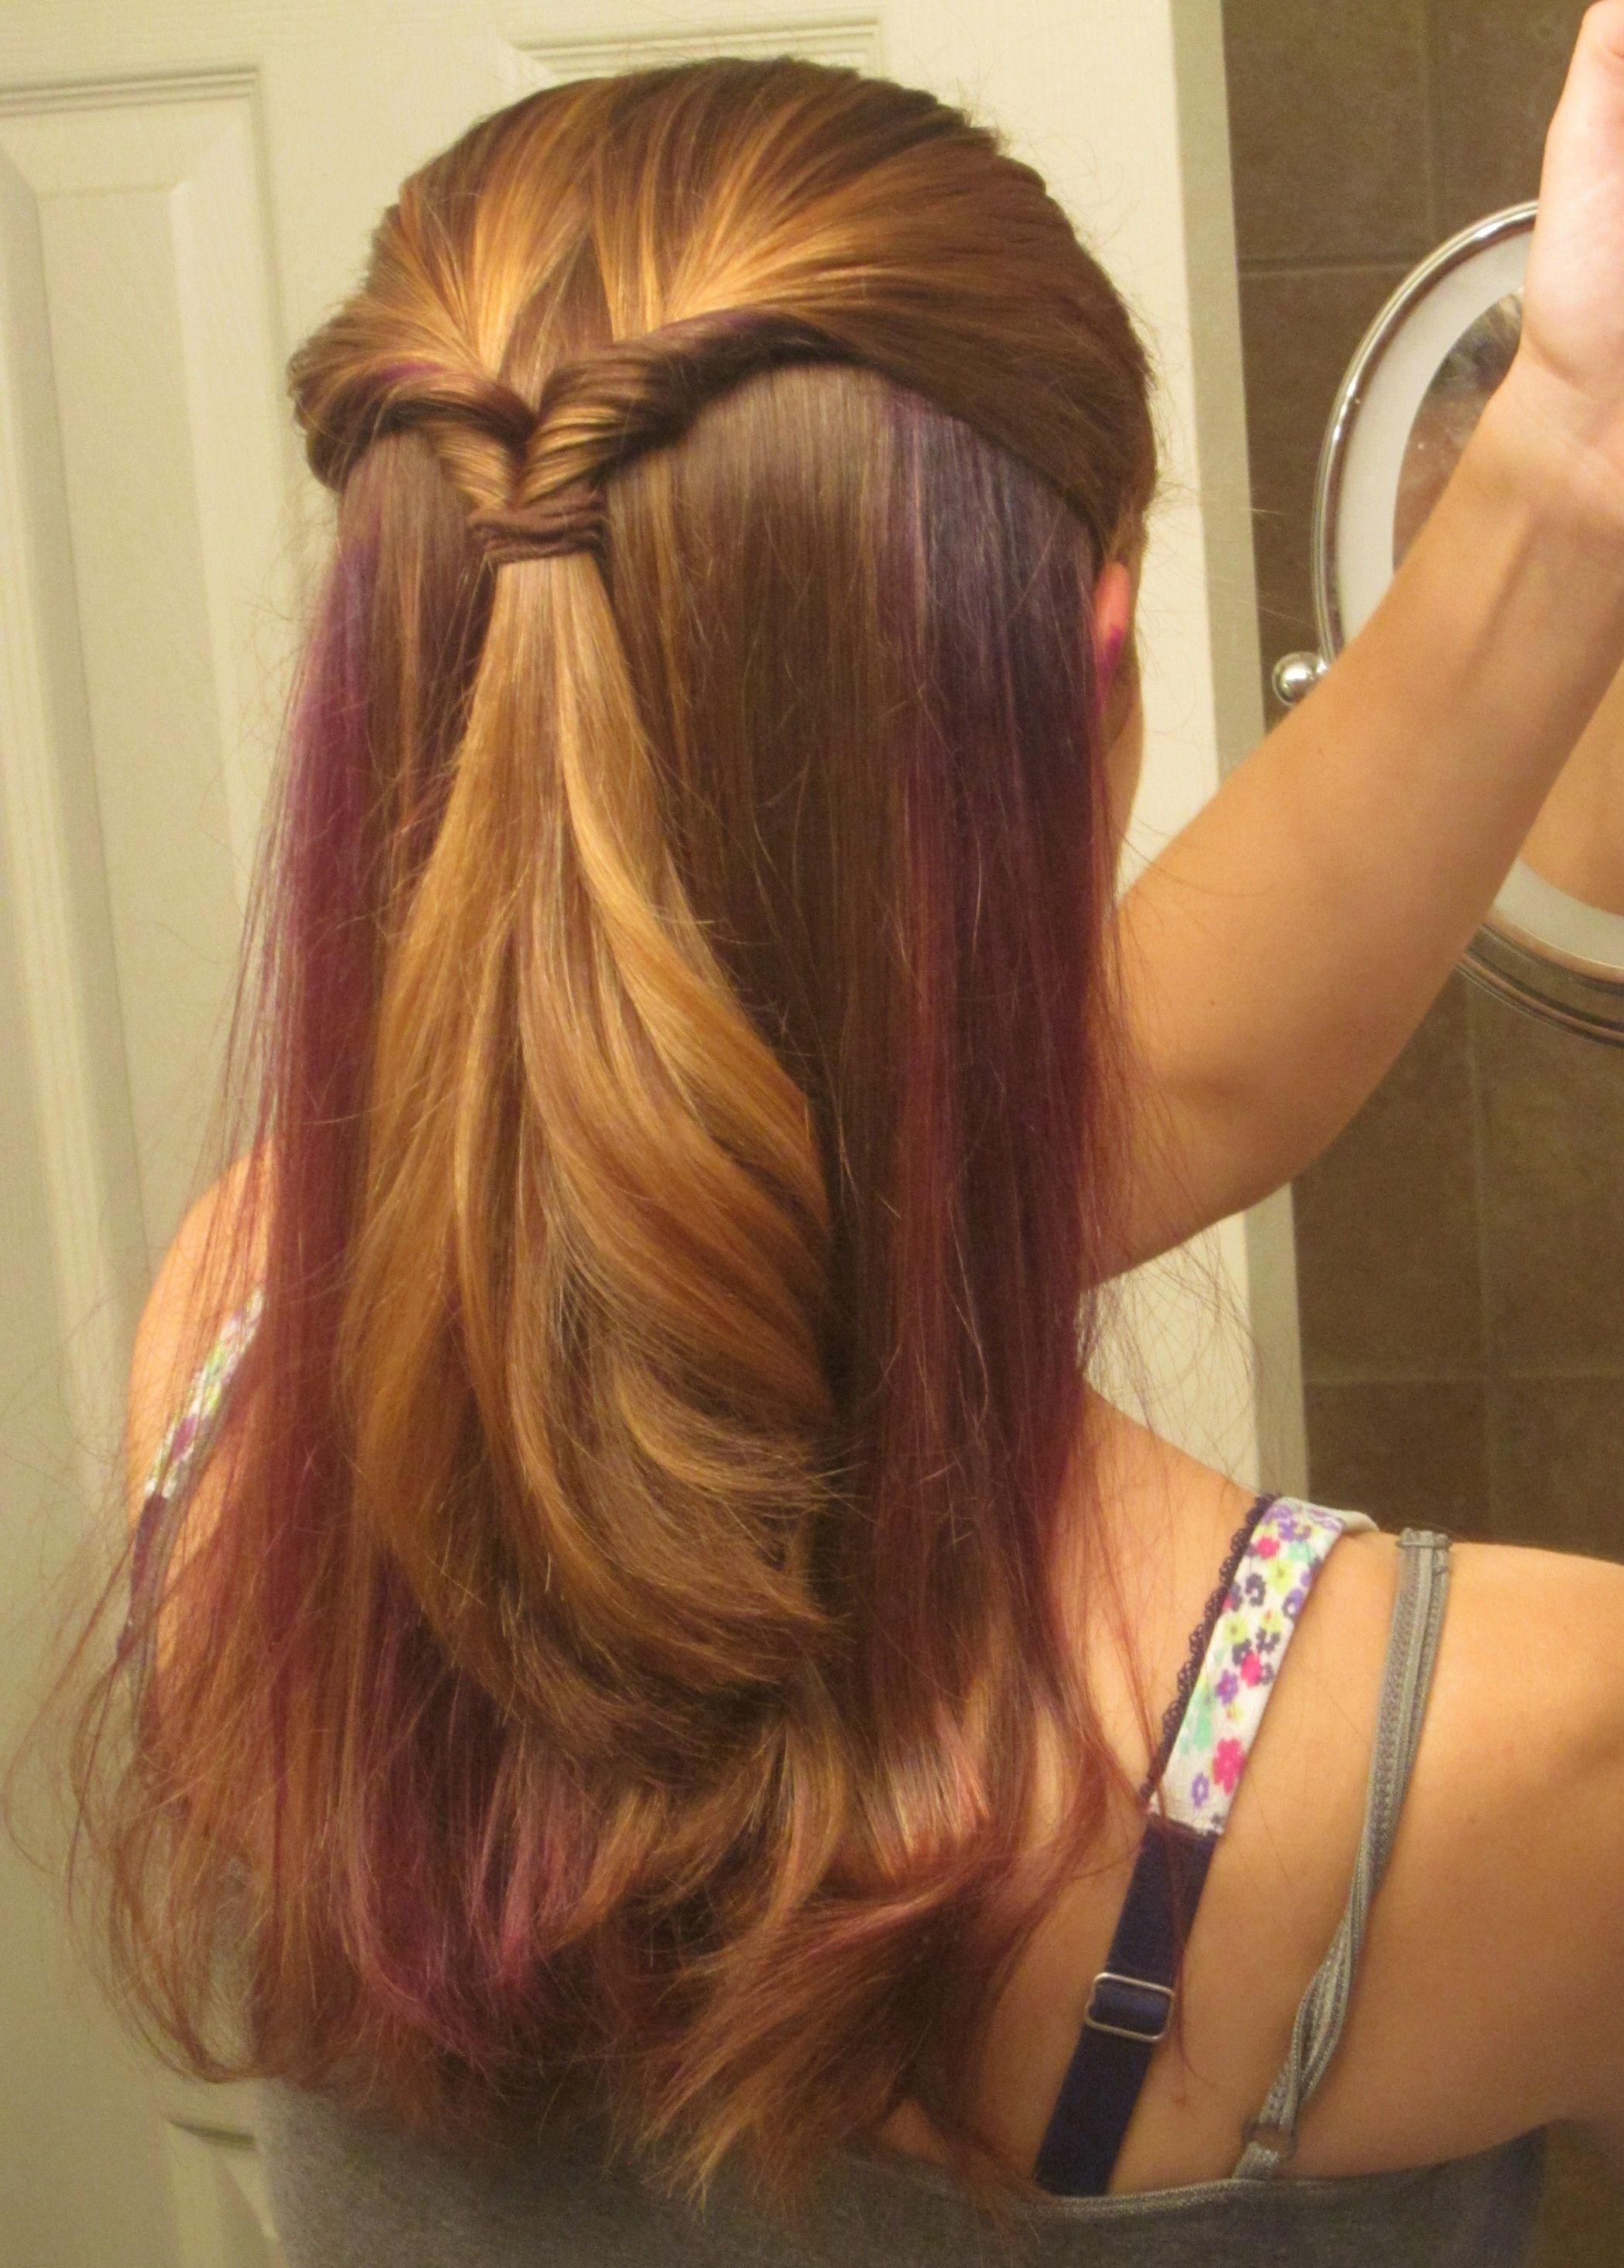 Purple Highlights Hidden Under Hair Style 3 Pinterest Purple